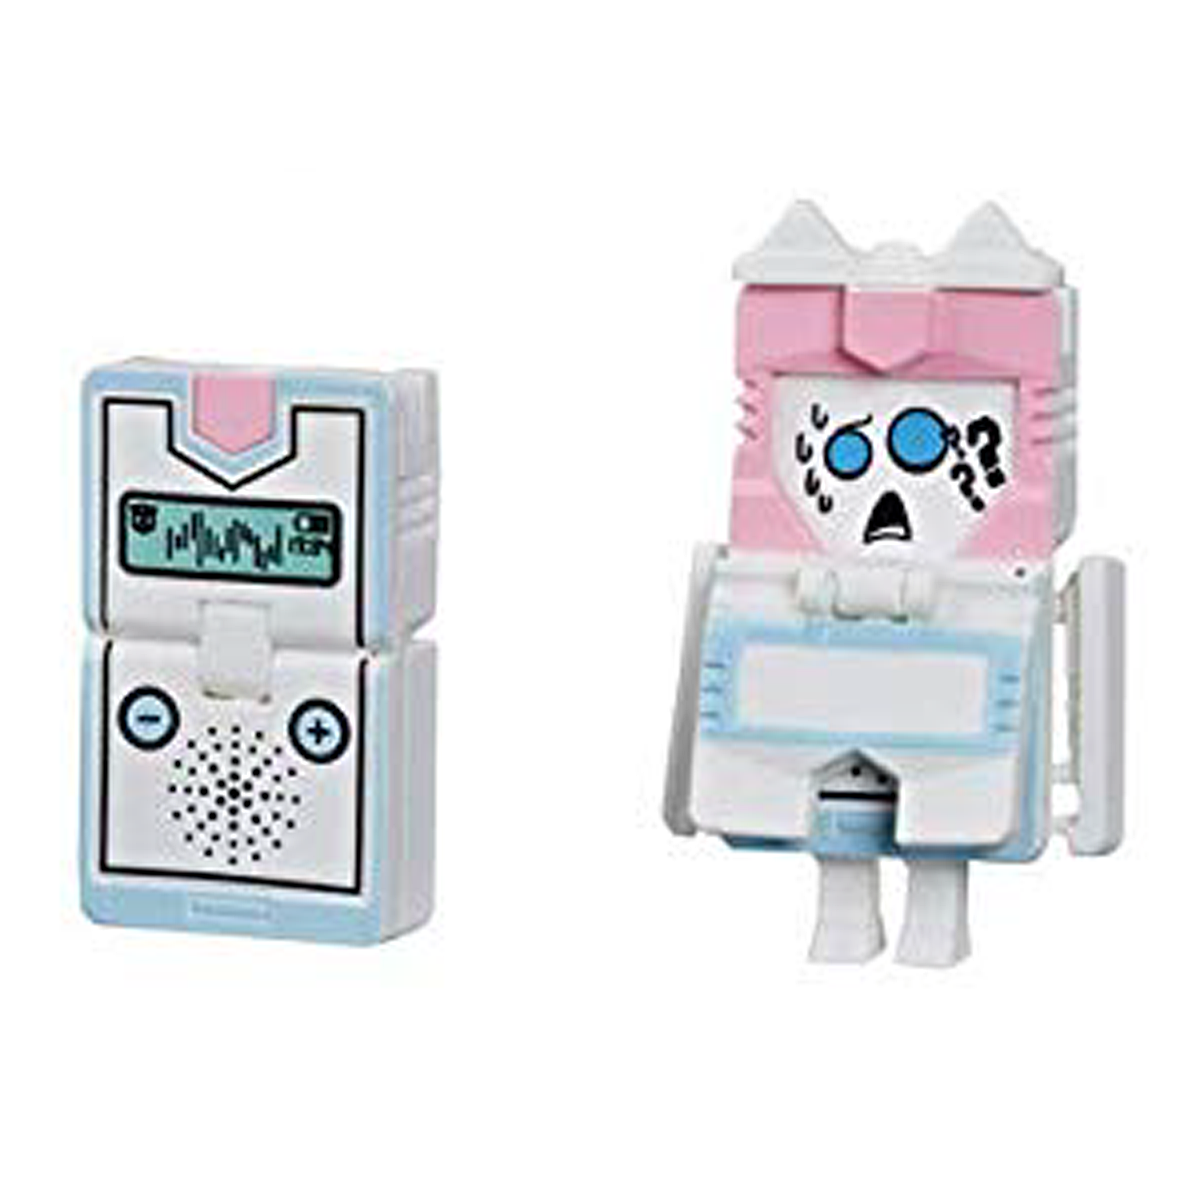 Nampy Transformers botbots Series 3 Goo Goo Groupies 2019 Hasbro Baby Crib